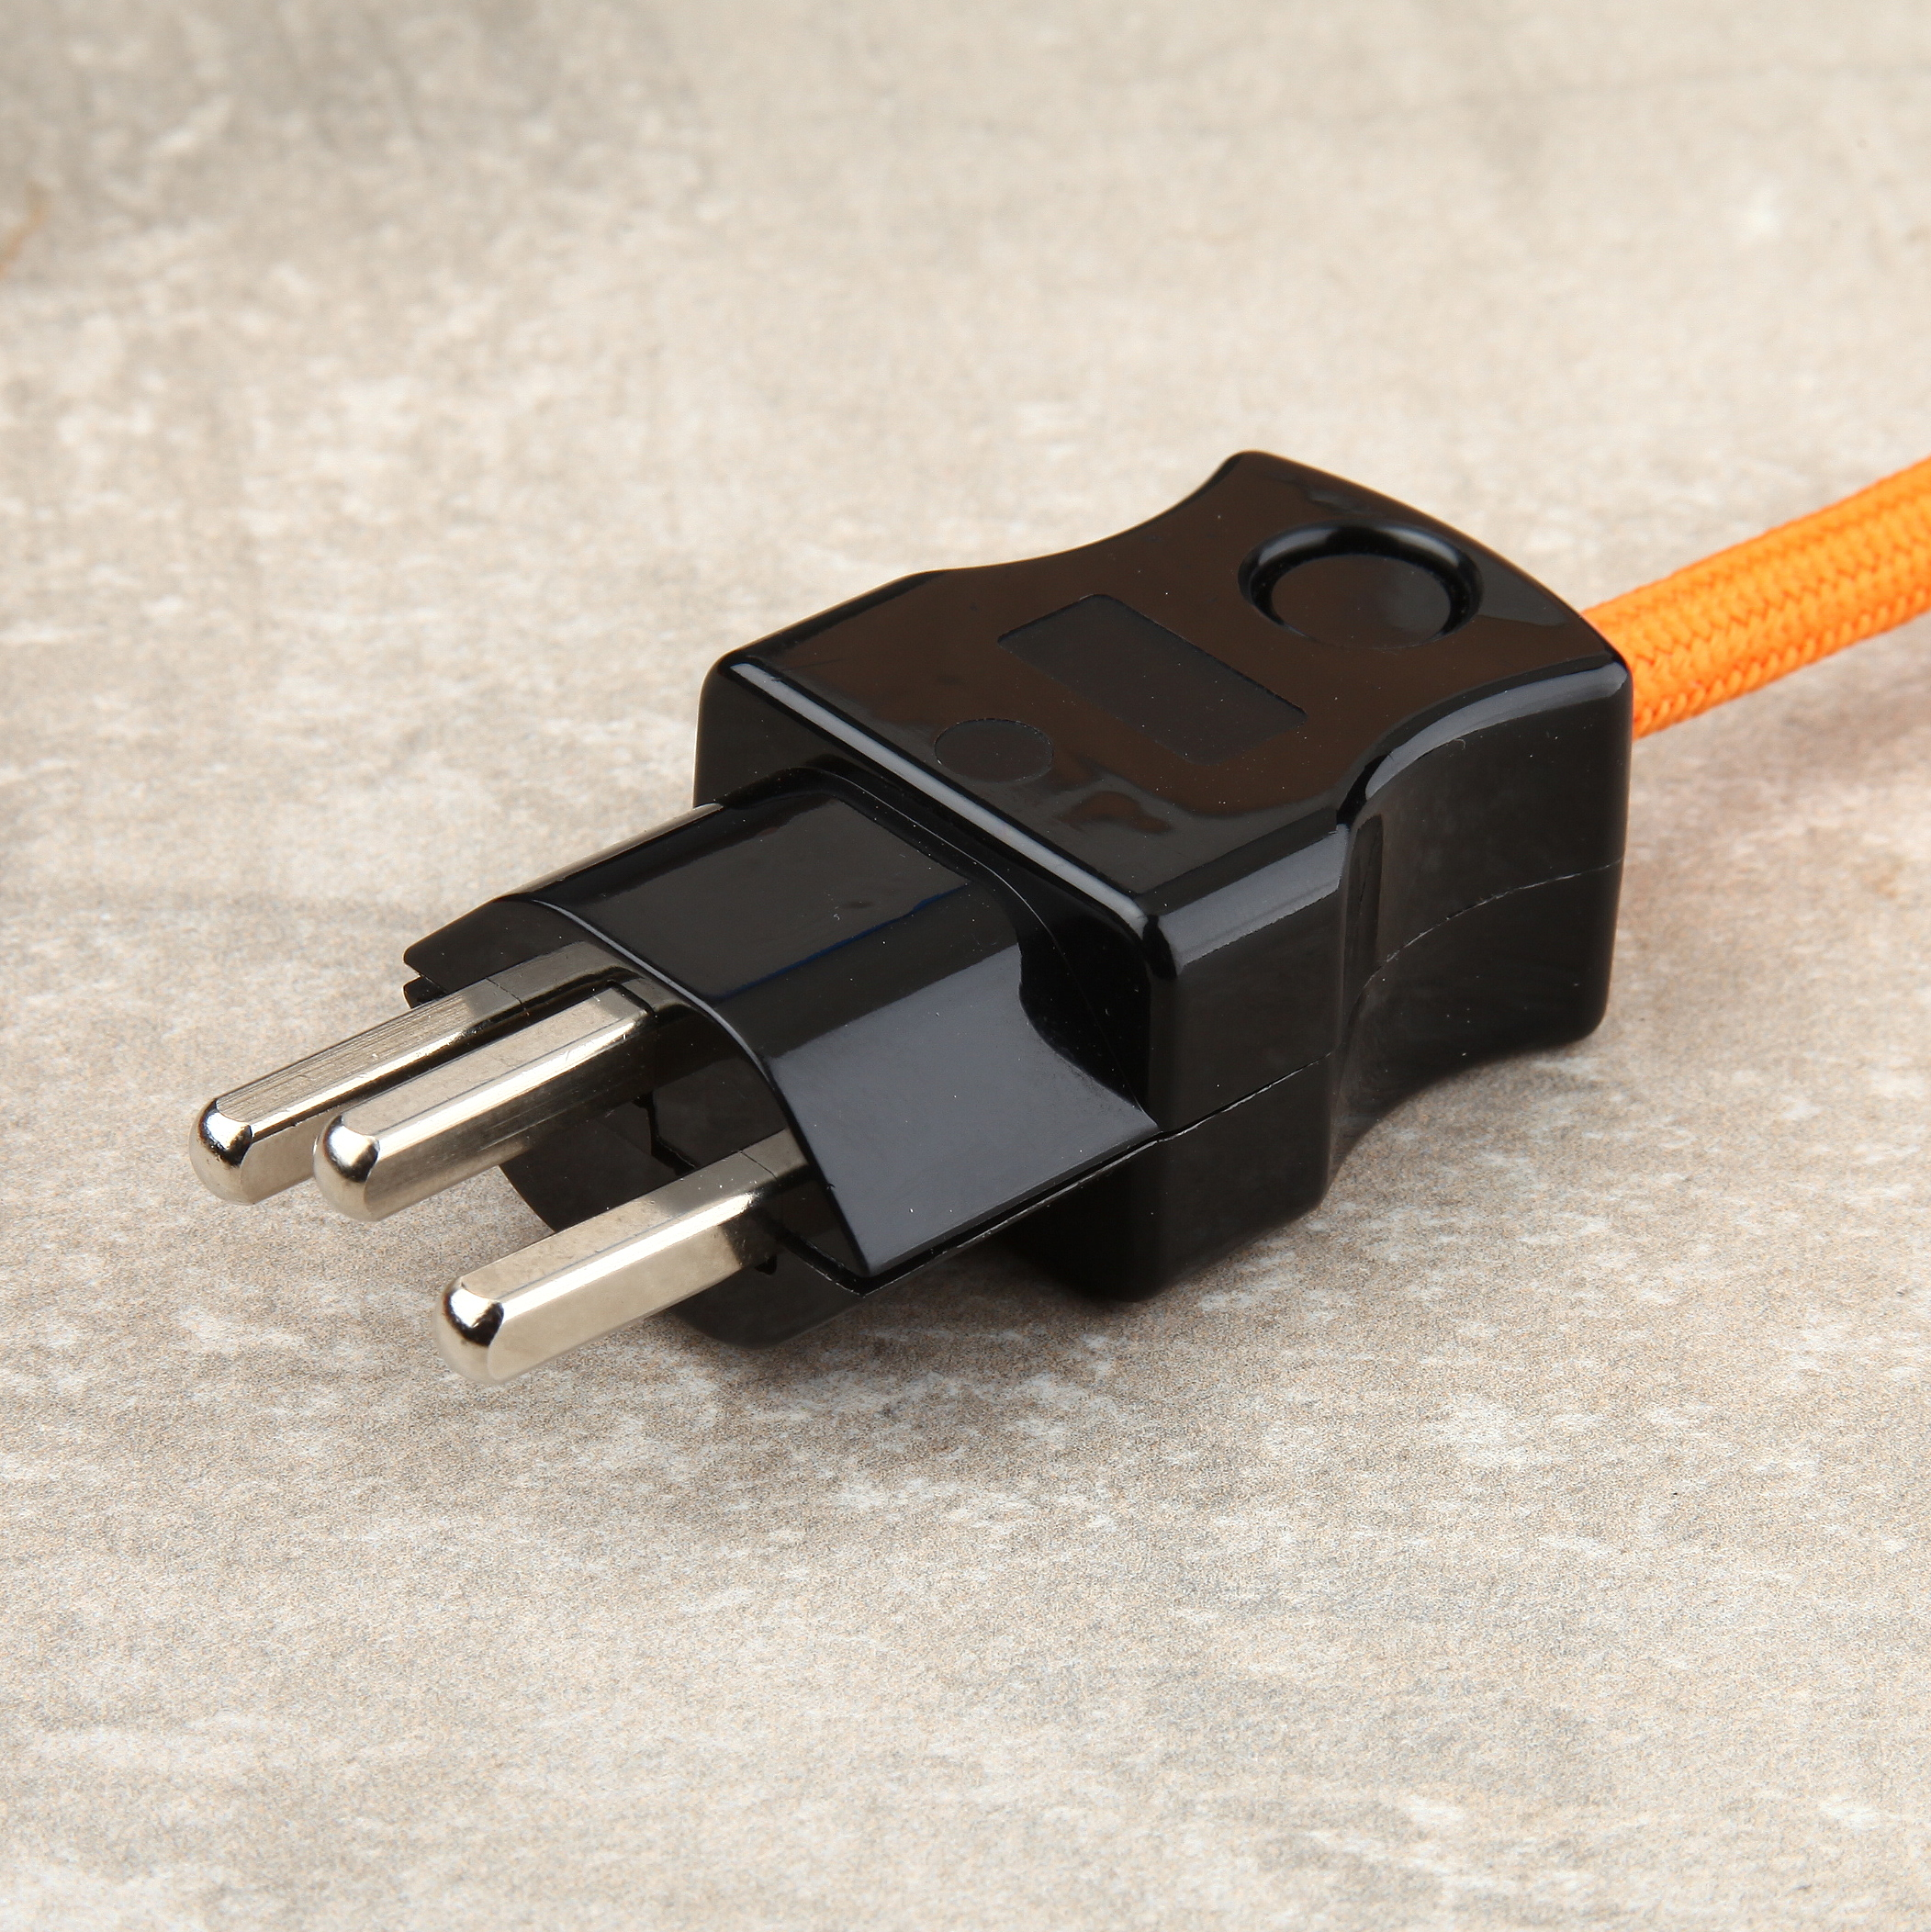 lampen schutzkontakt stecker schweiz selber montieren 2 diy lampenbau schweiz. Black Bedroom Furniture Sets. Home Design Ideas